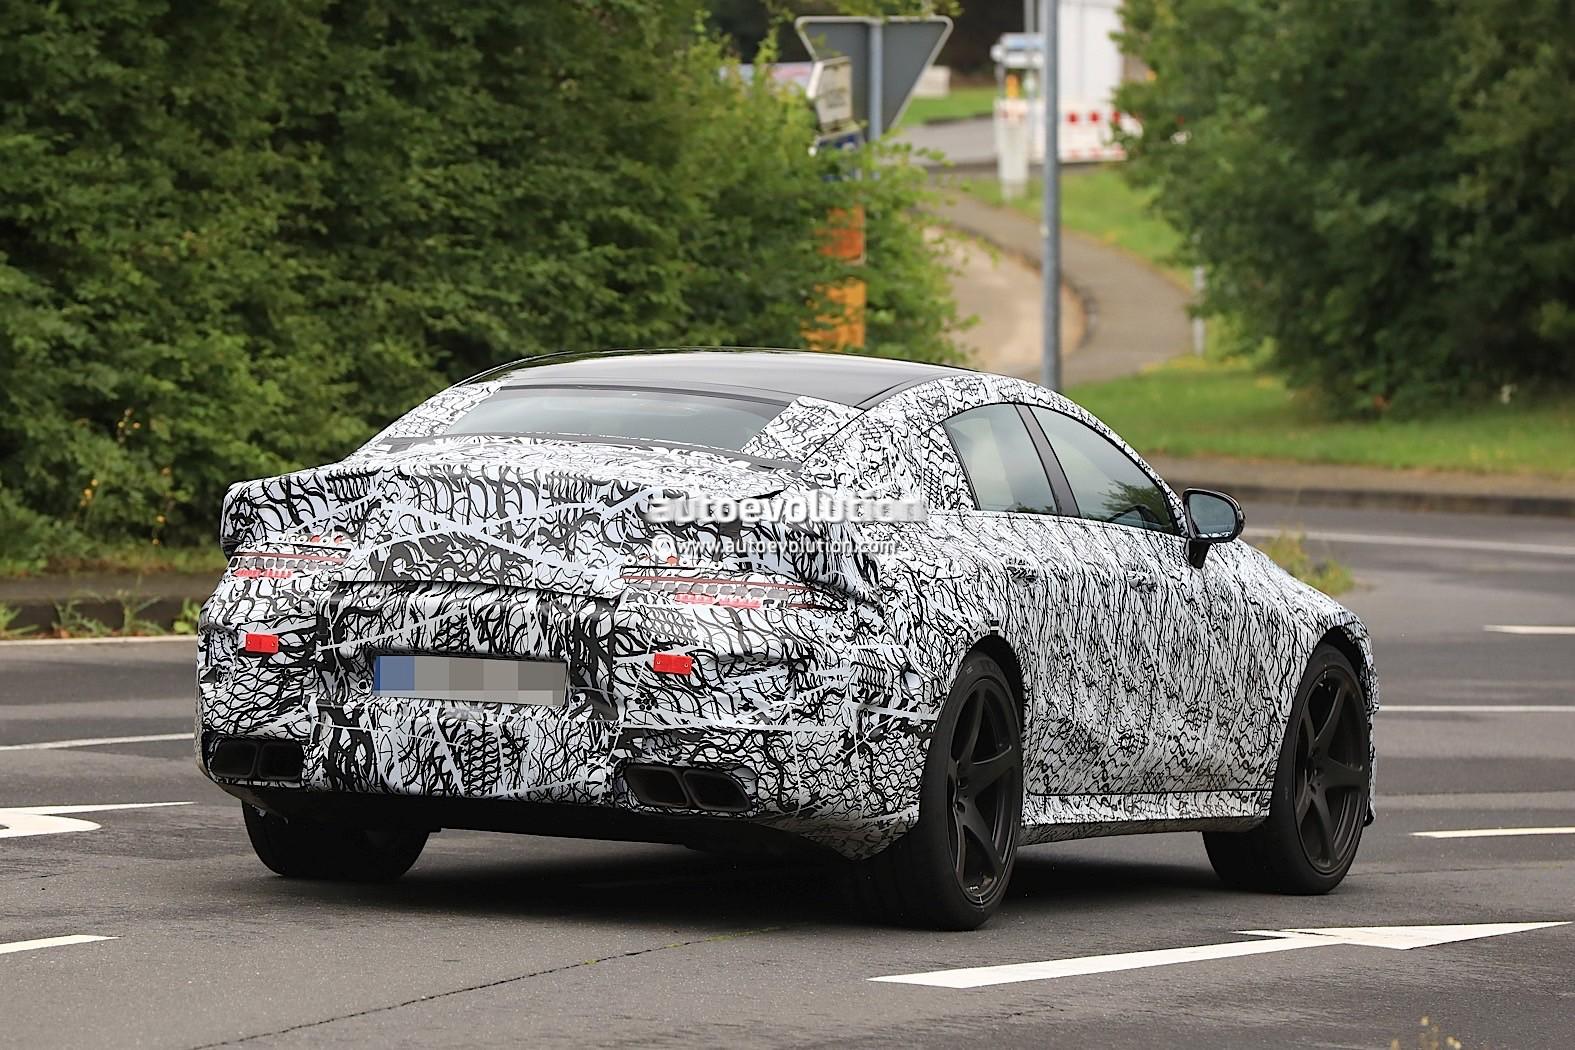 Spyshots 2019 Mercedes Amg Four Door Flaunts Panamericana Grille Looks Vicious Autoevolution